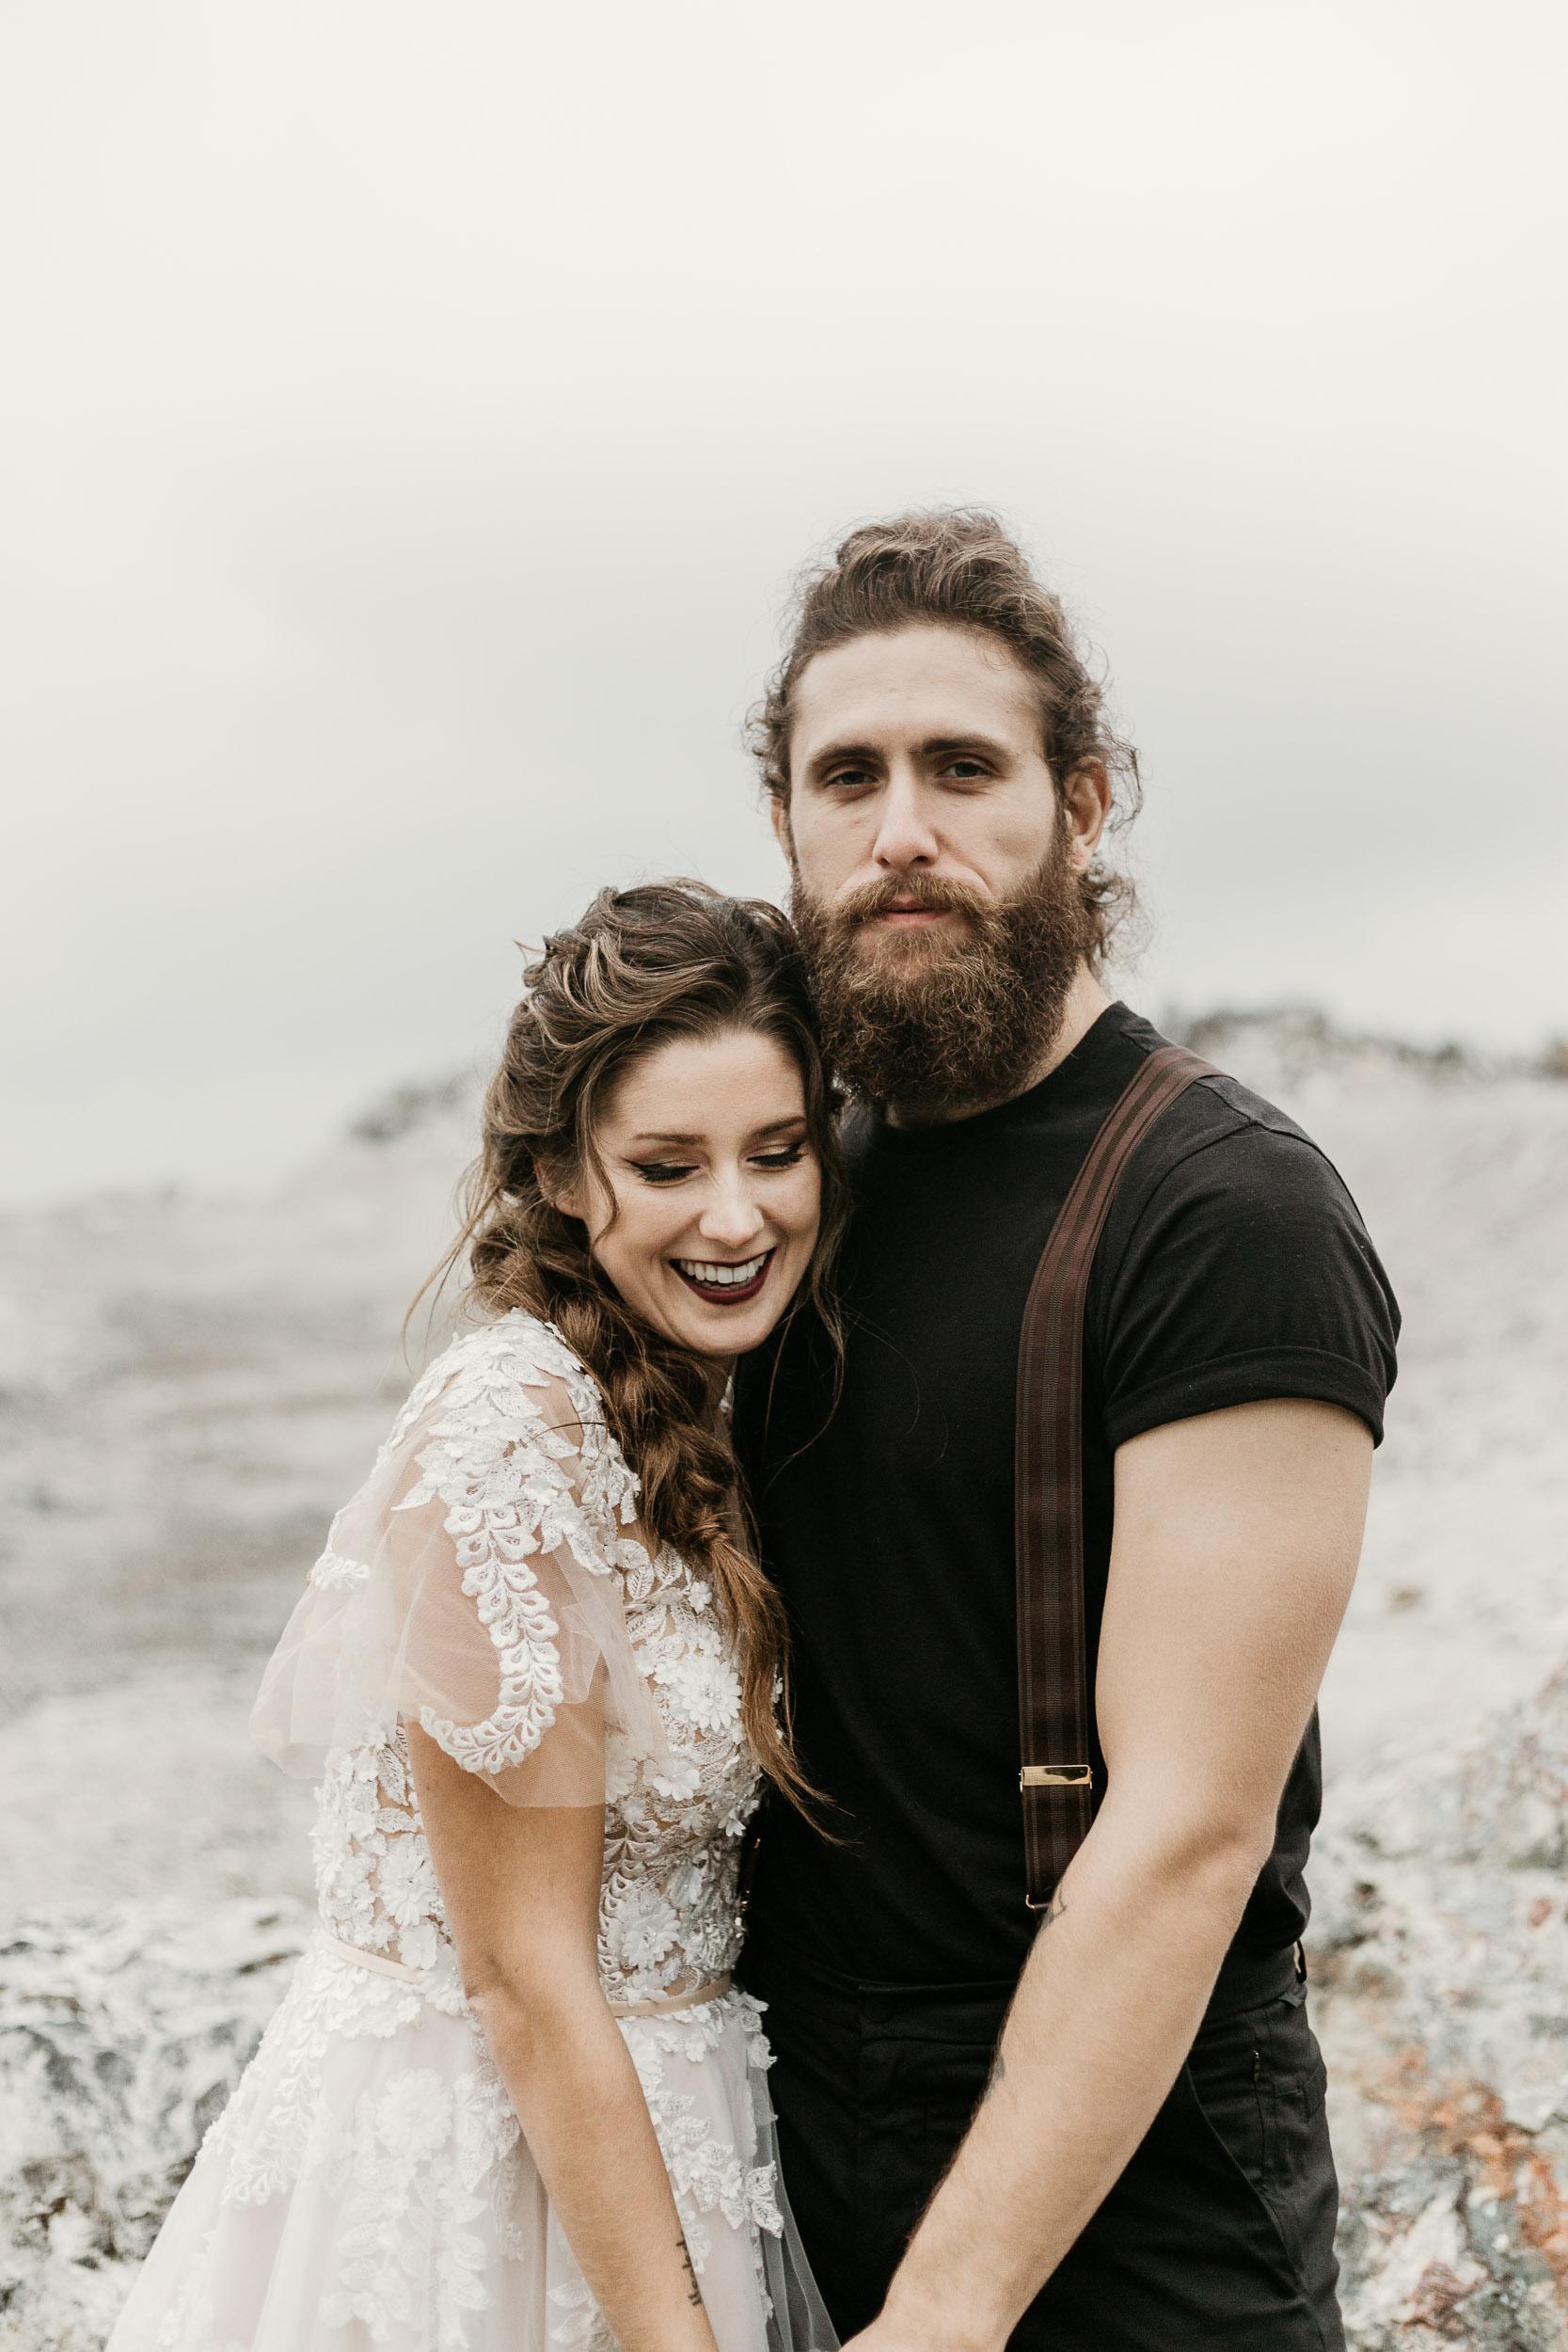 intimate-wedding-elopement-photographer-ottawa-toronto-1150.jpg